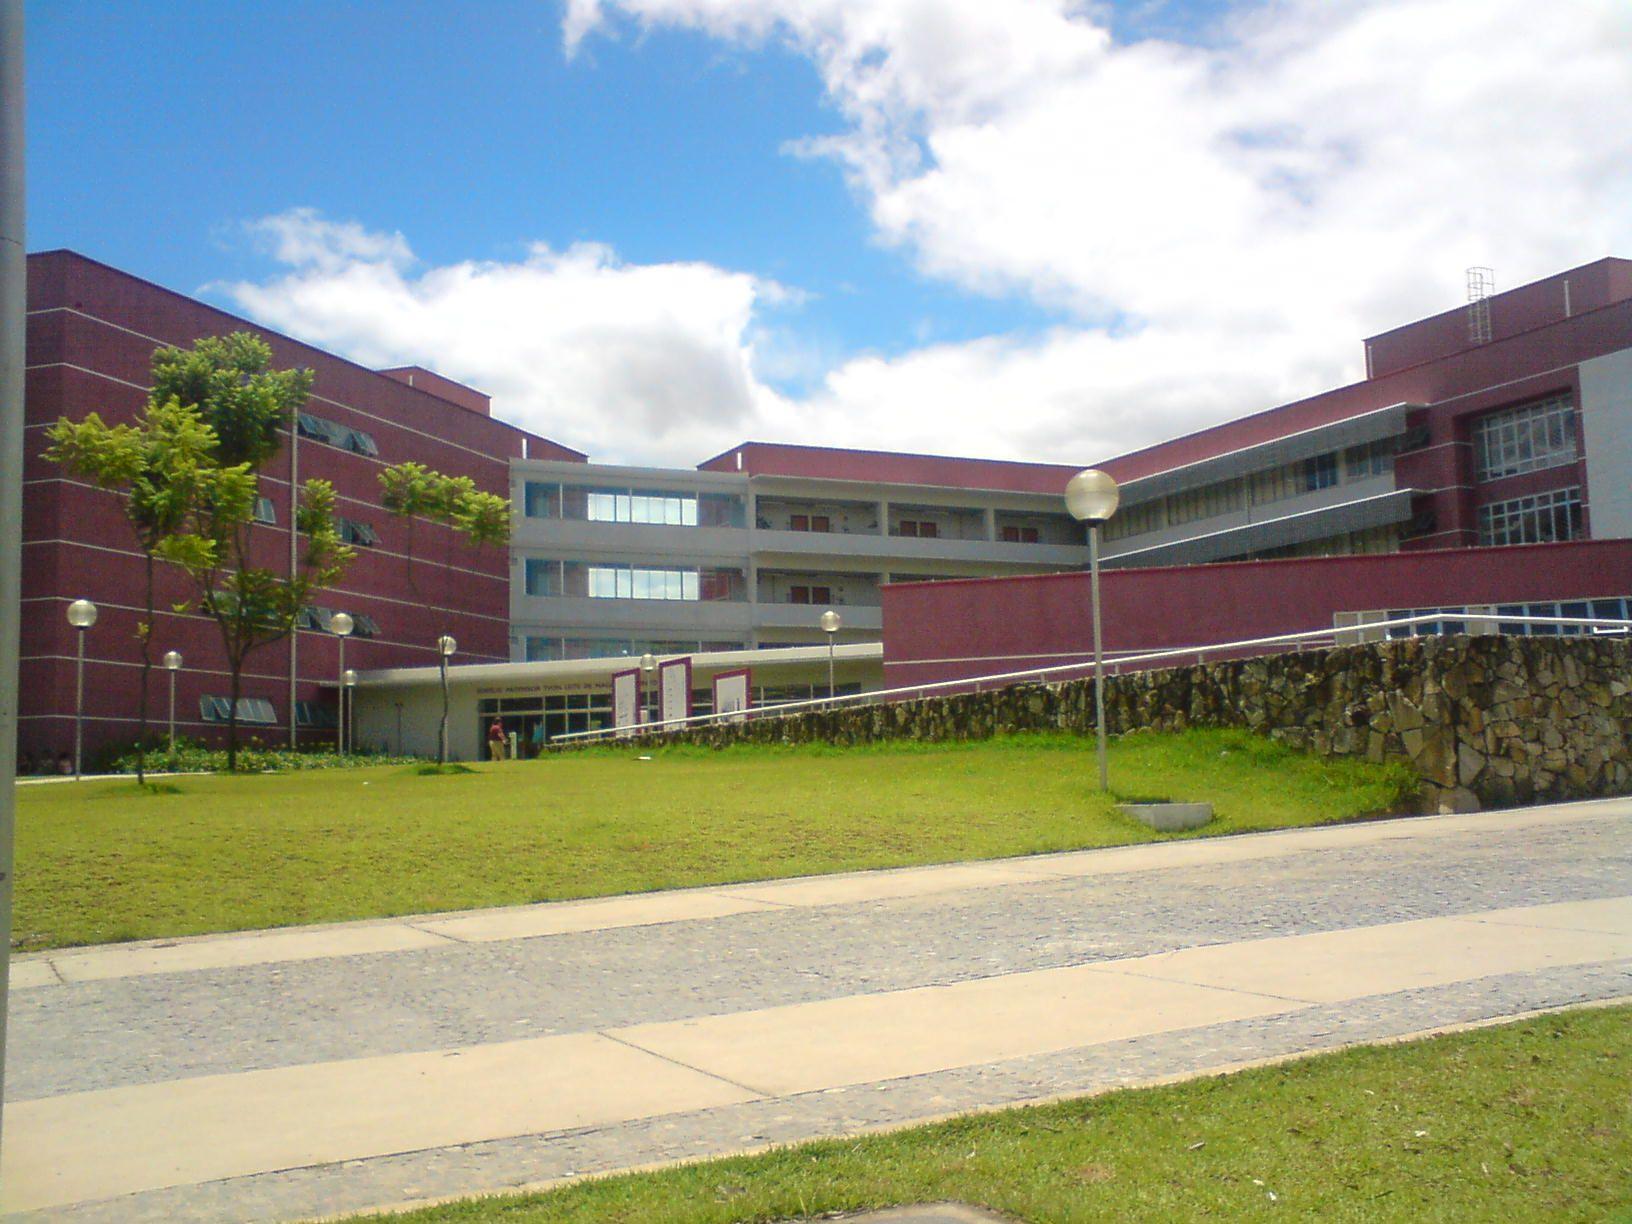 Ufmg Faculdade De Ciencias Economicas Face Ciencias Economicas